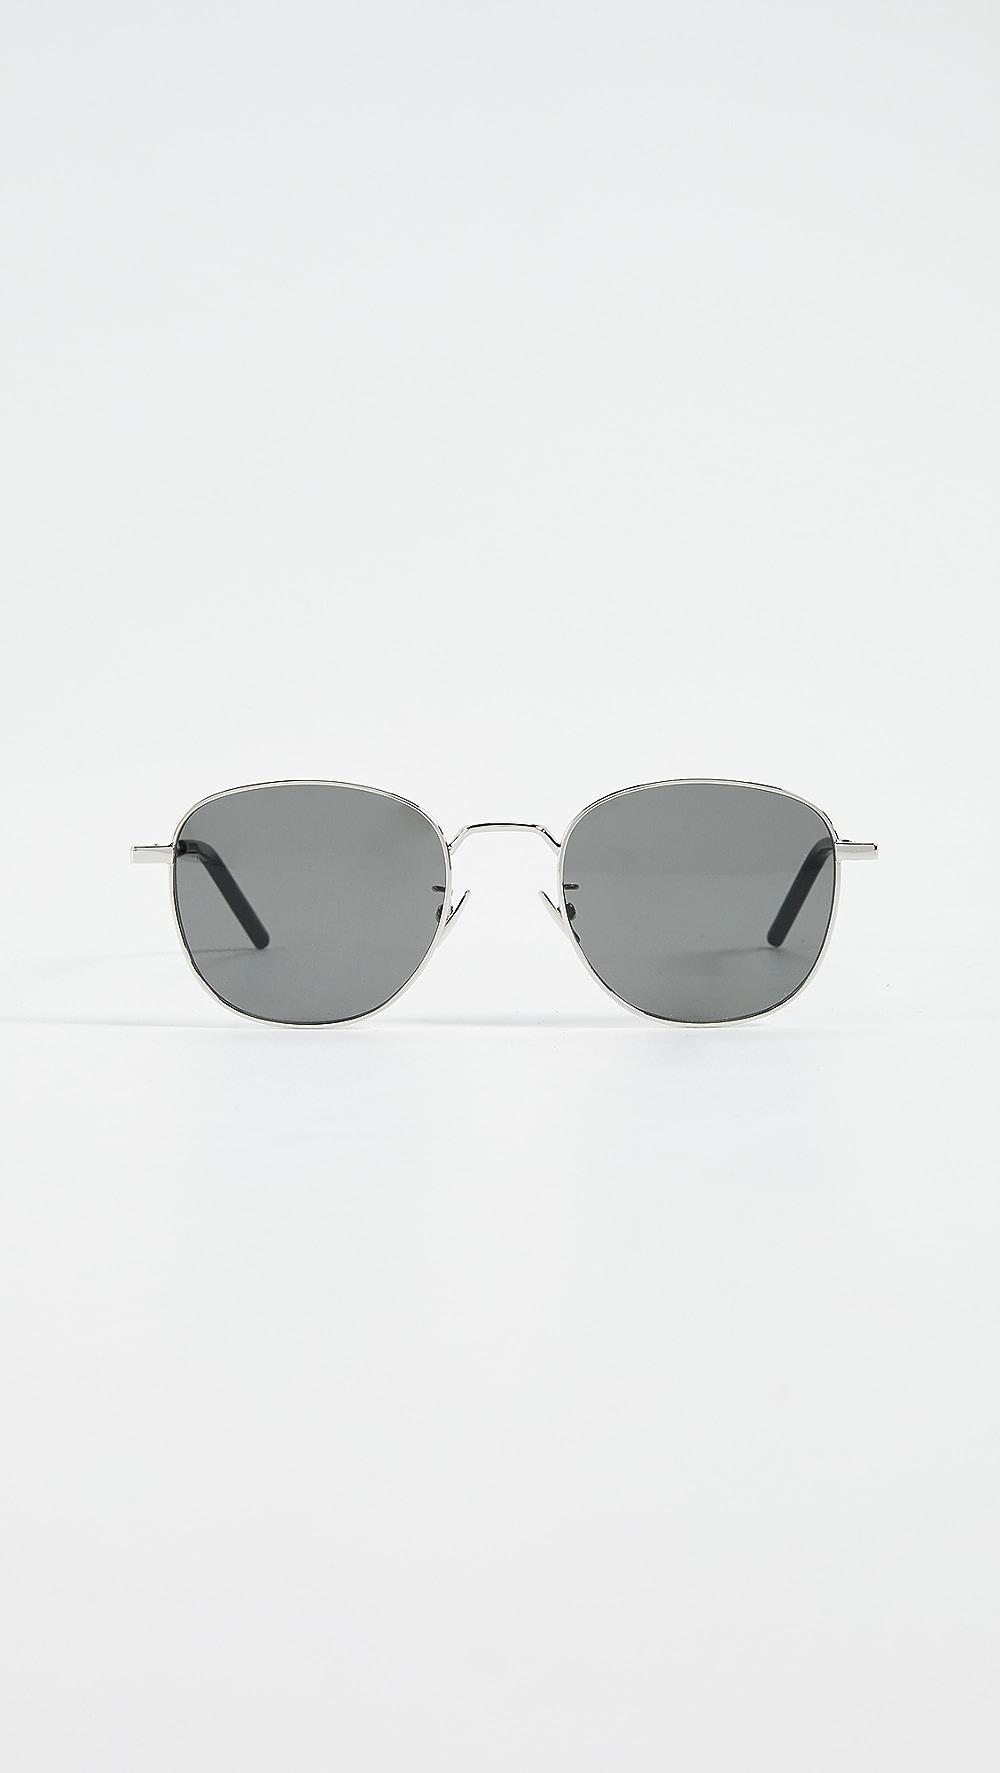 Alert Saint Laurent - Classic Soft Square Metal Sunglasses Good Reputation Over The World